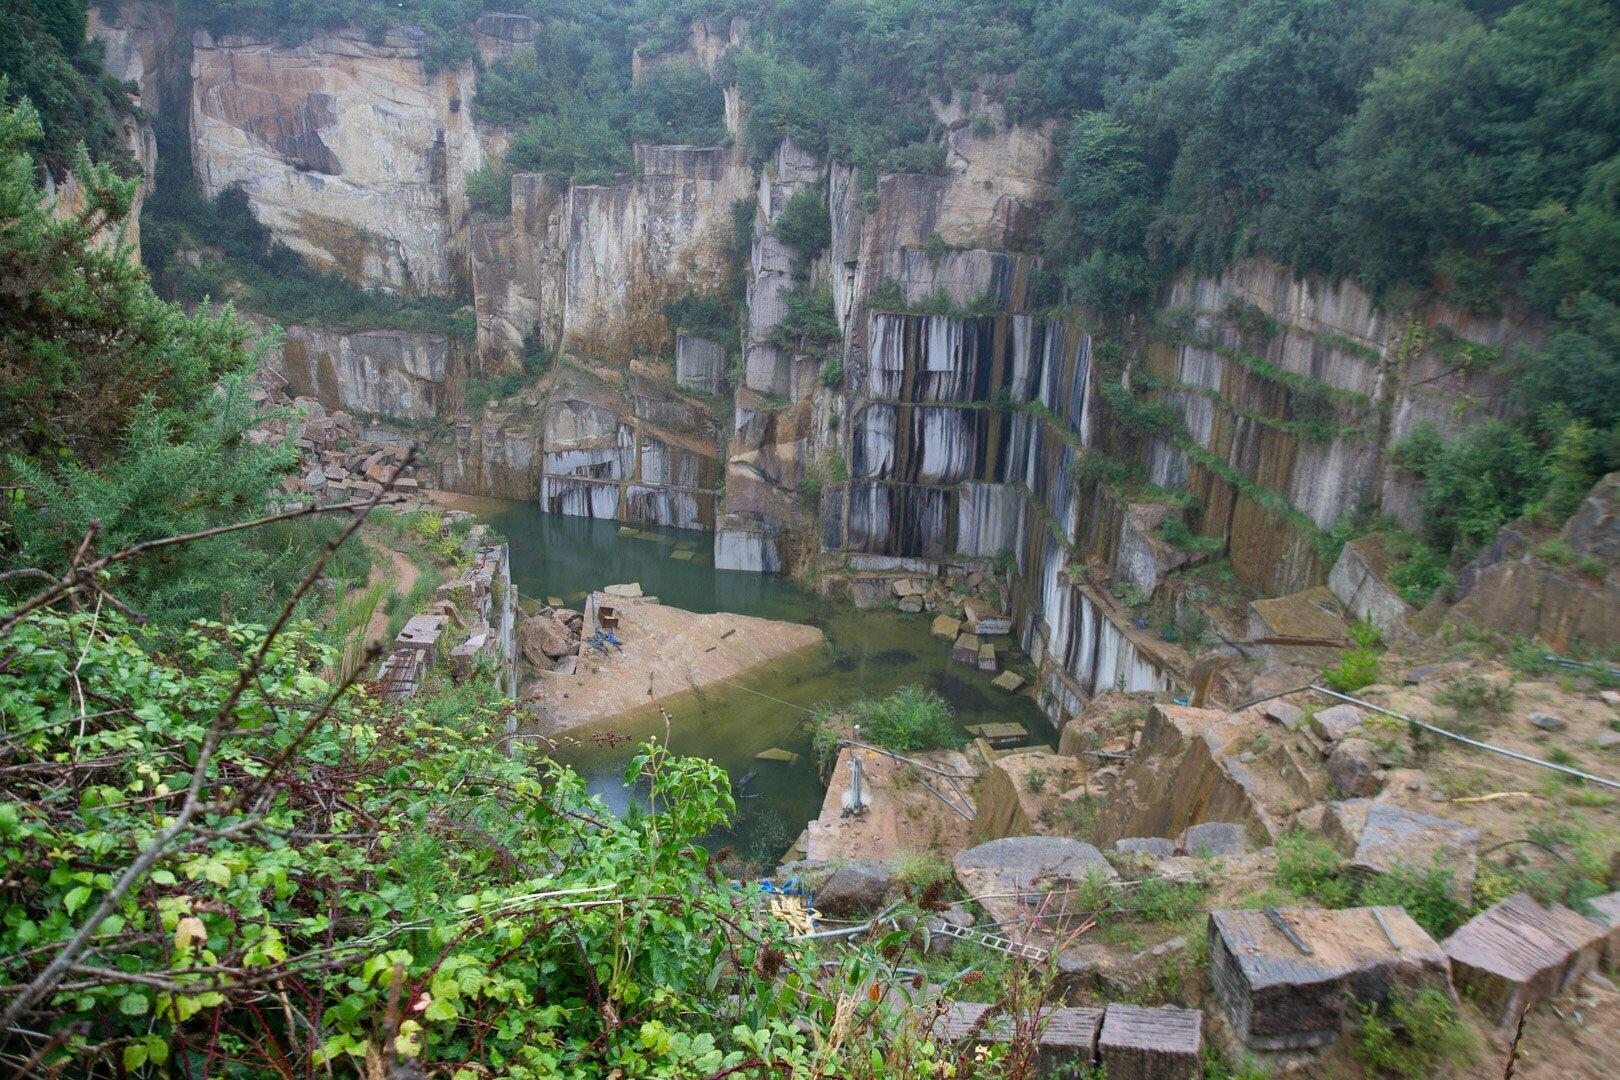 carrière de granit rose à Perros-Guirec